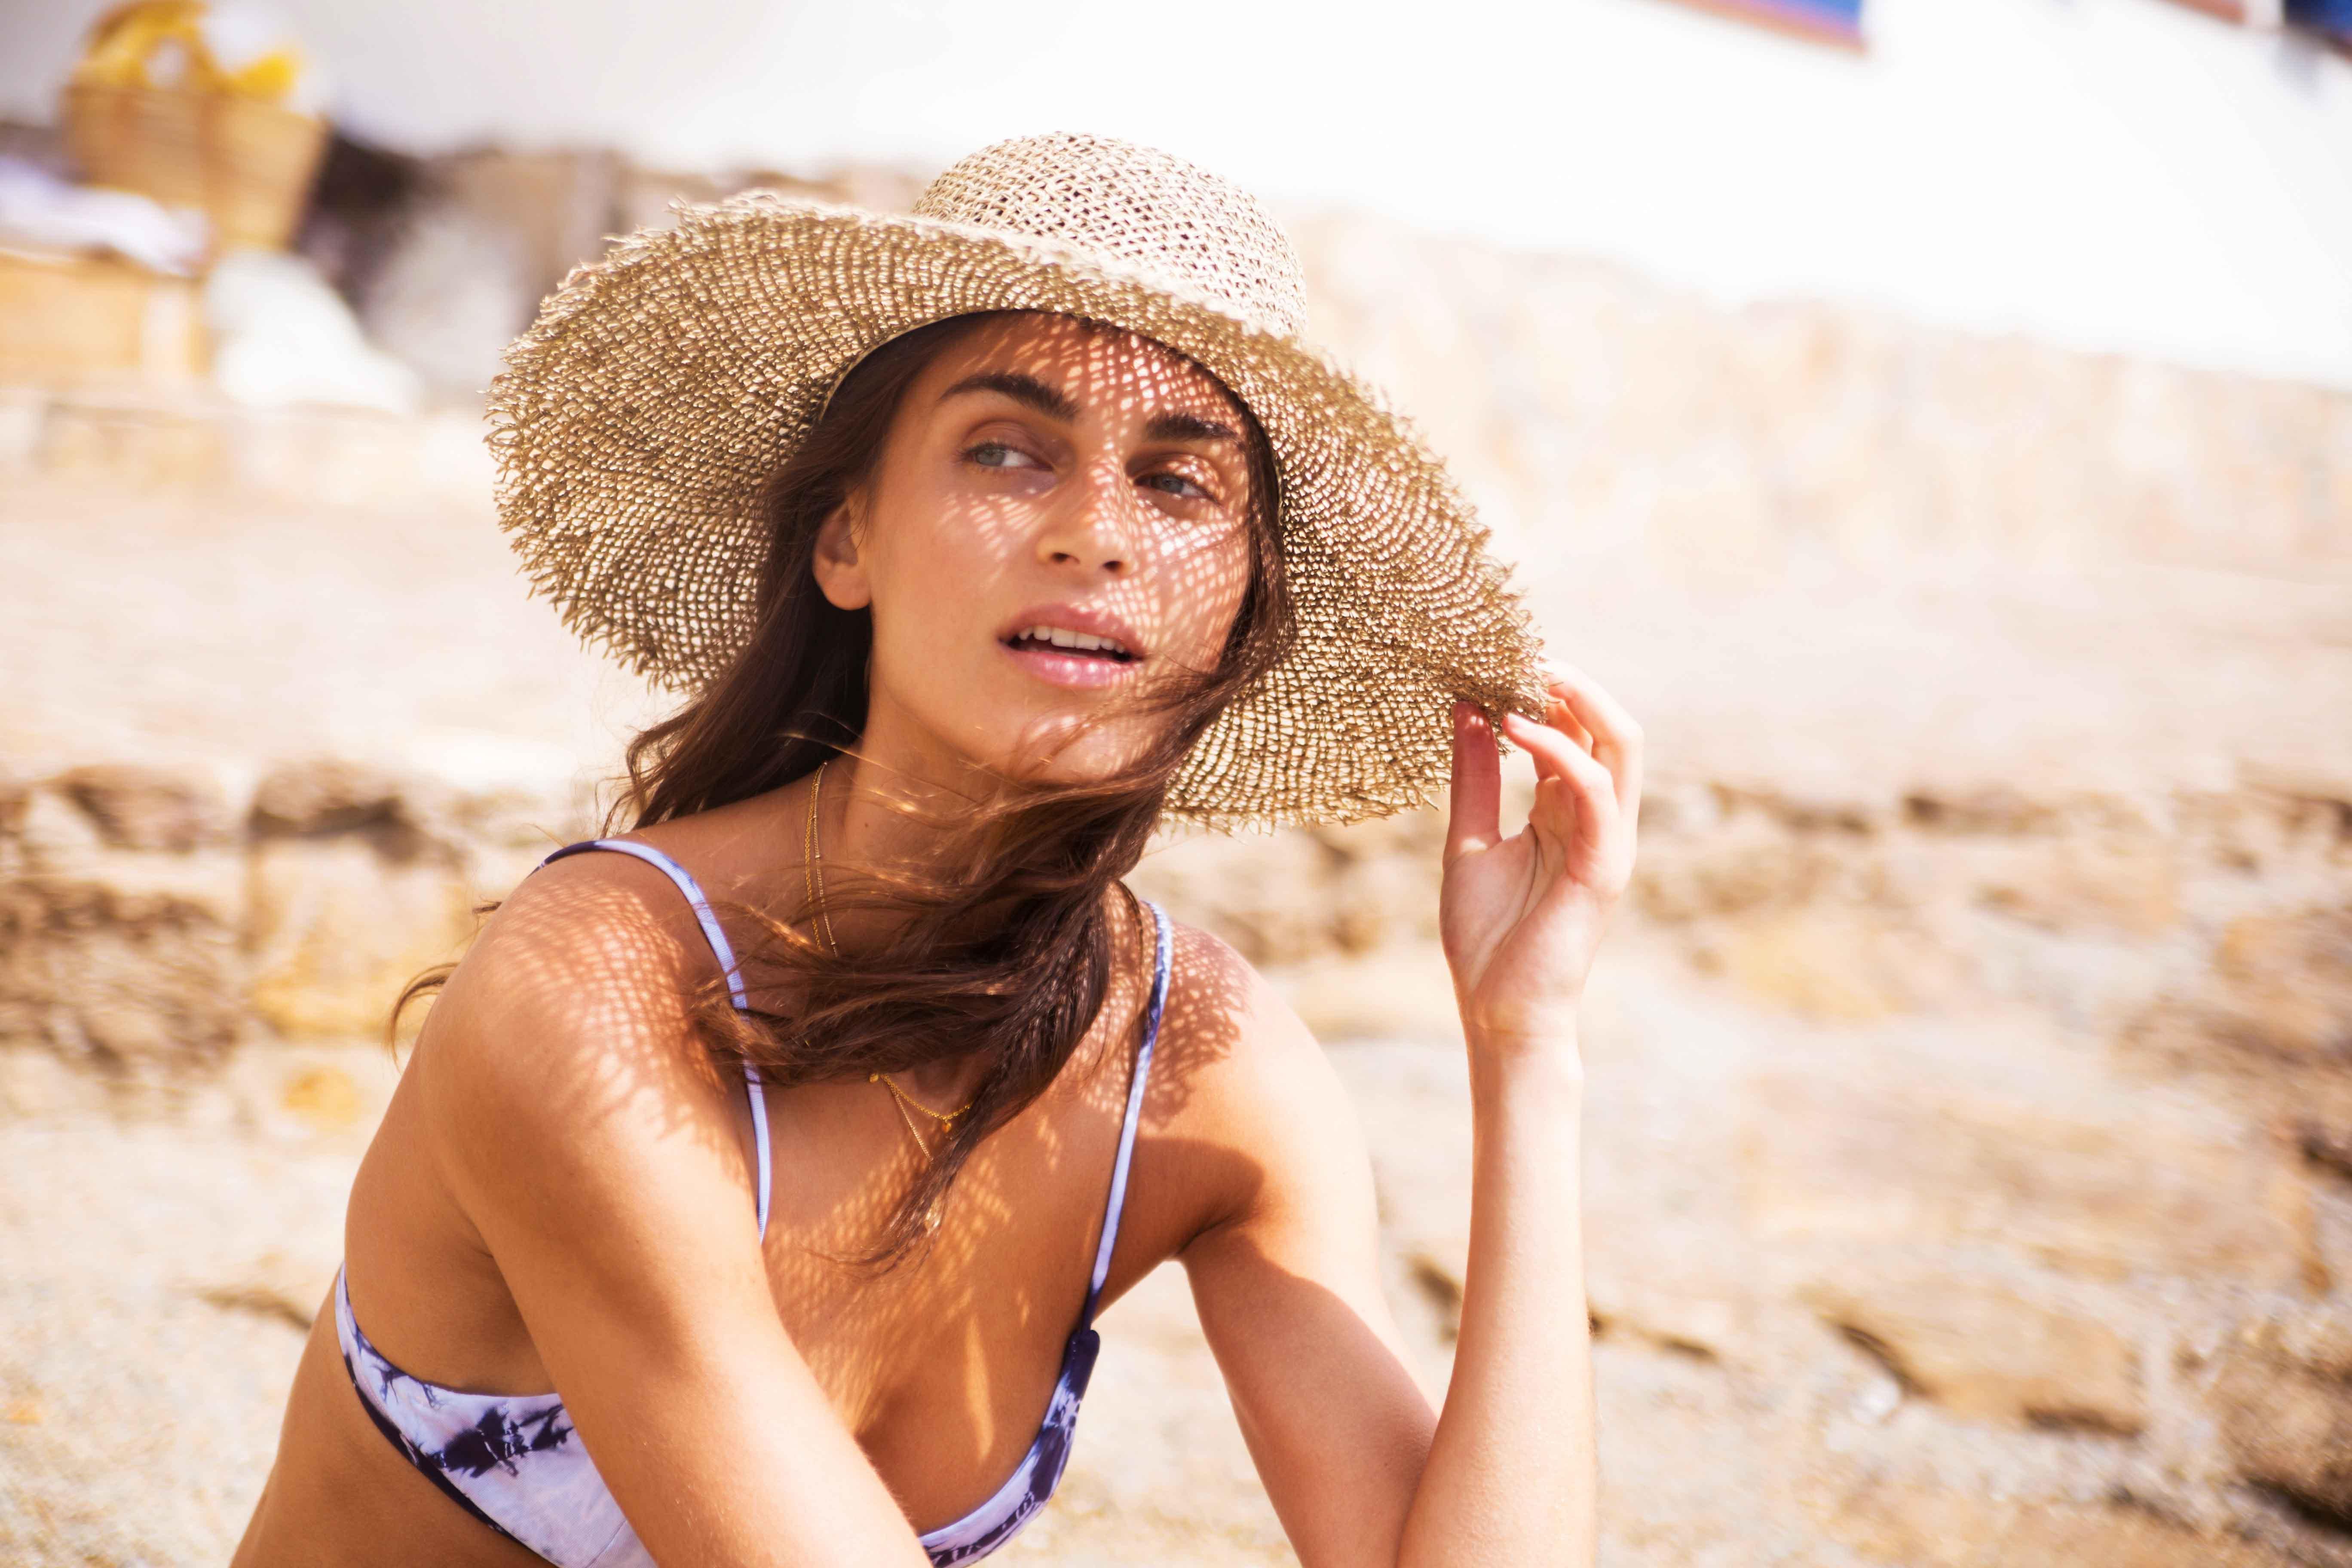 купальники Serendipity Swimwear 2019 Dolce Vita Collection - протестированы на Амальфийском побережье моделью Джулией Паллесен / Julie Pallesen by Carlotta Jurado